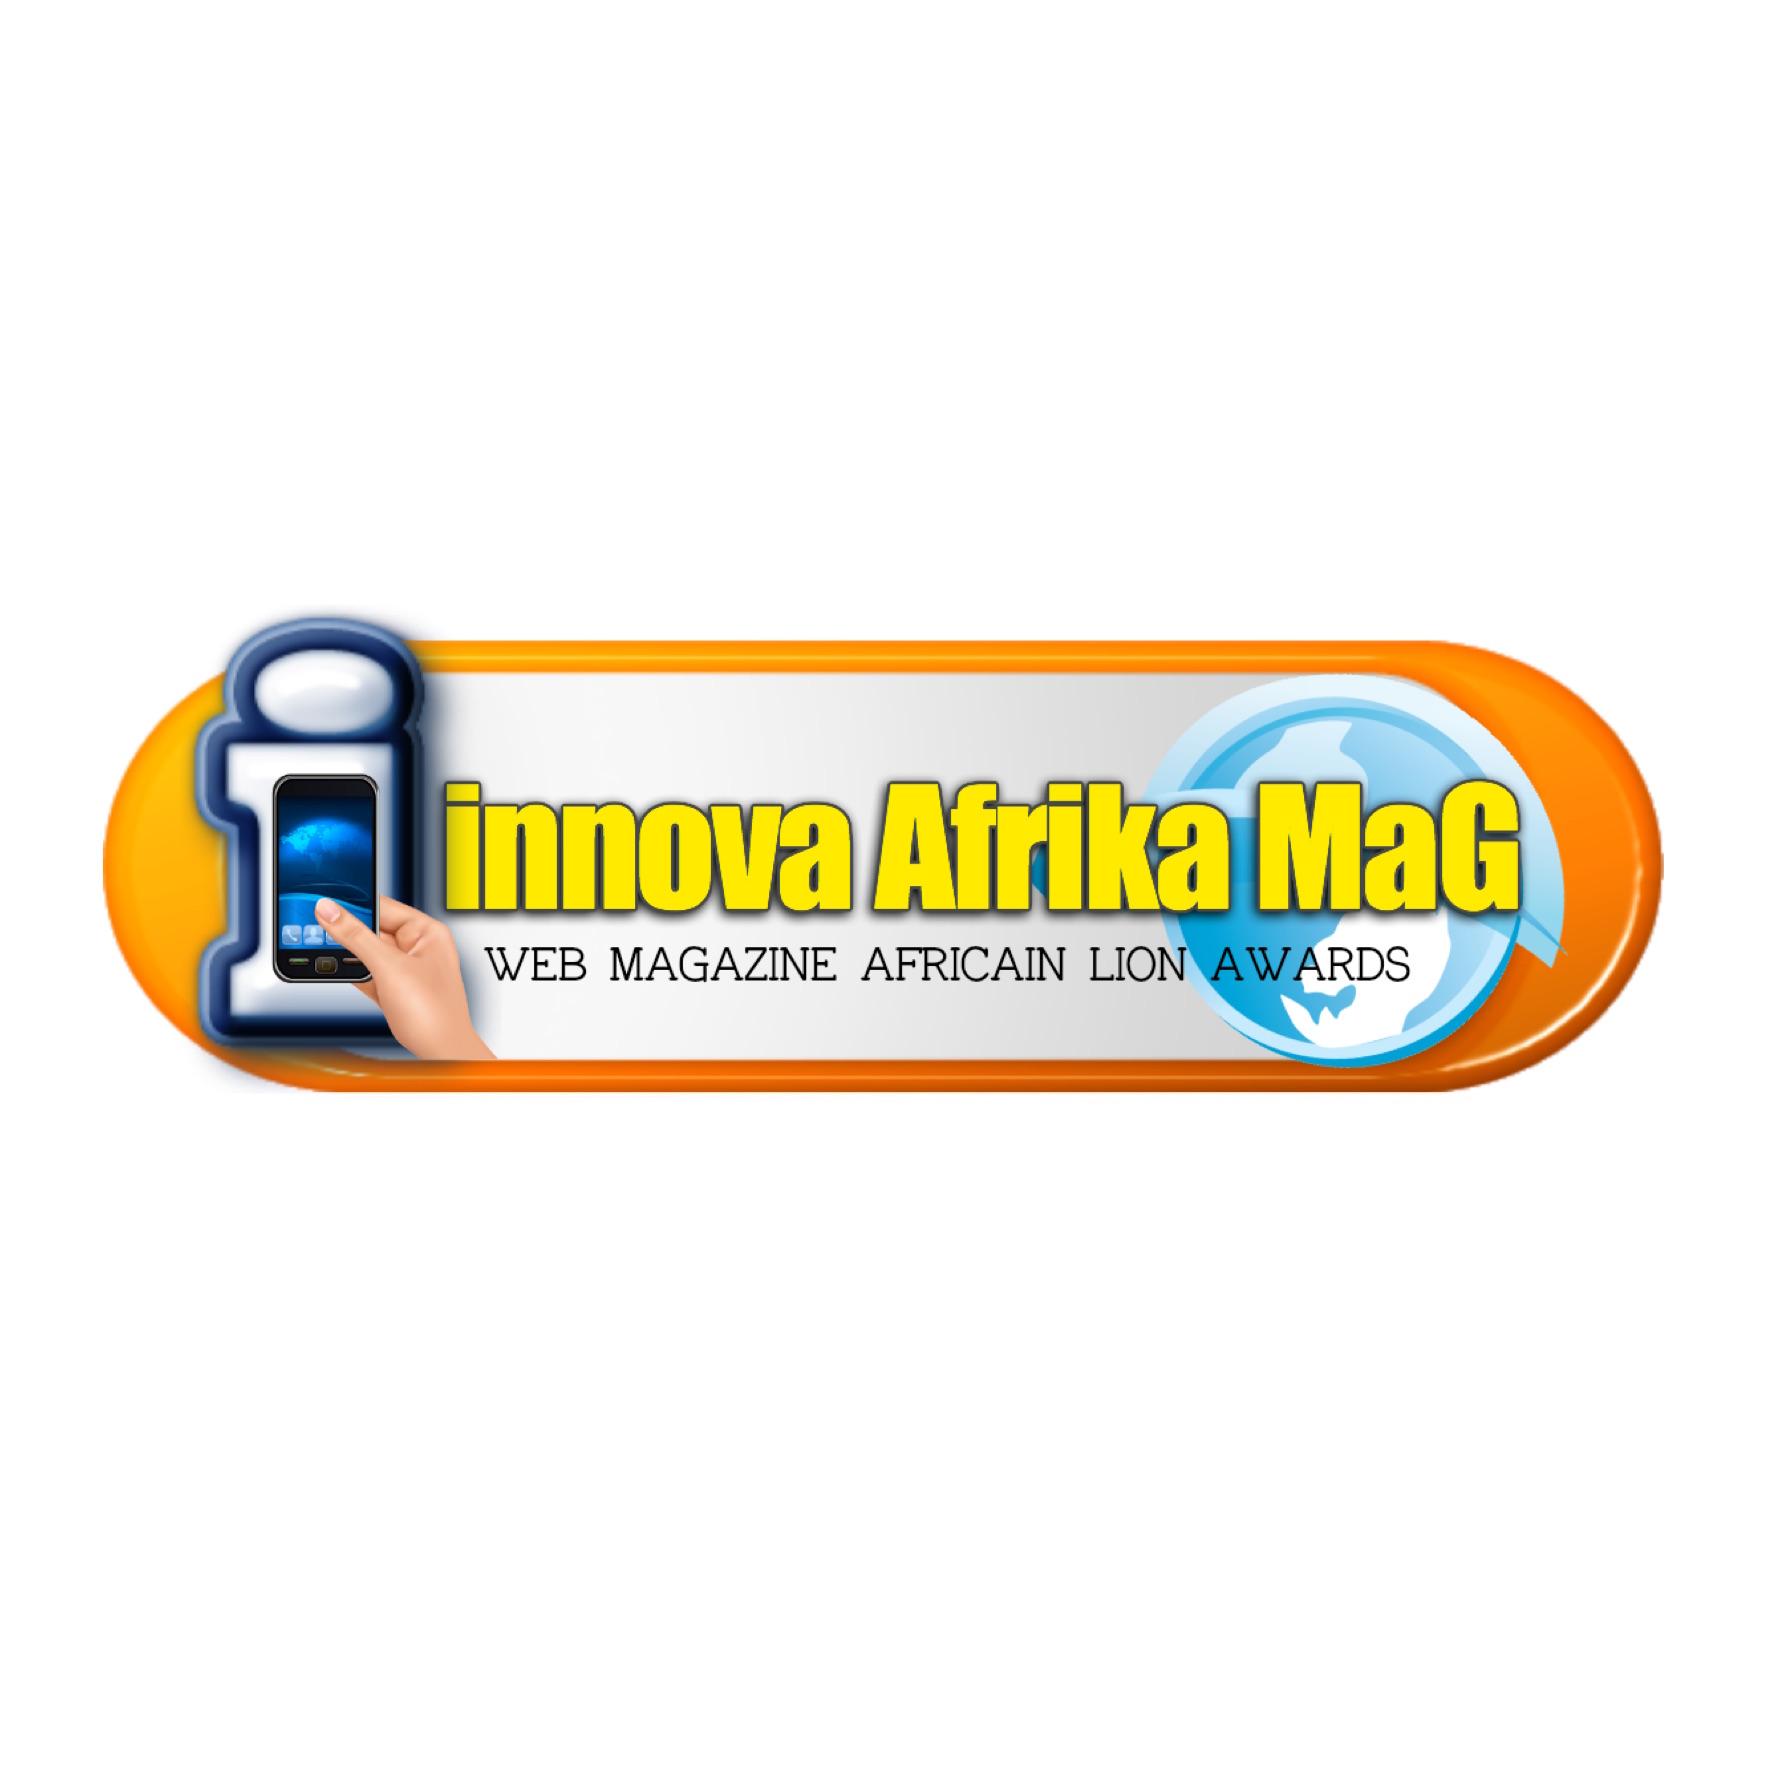 INNOVA AFRIKA MAG-WEB